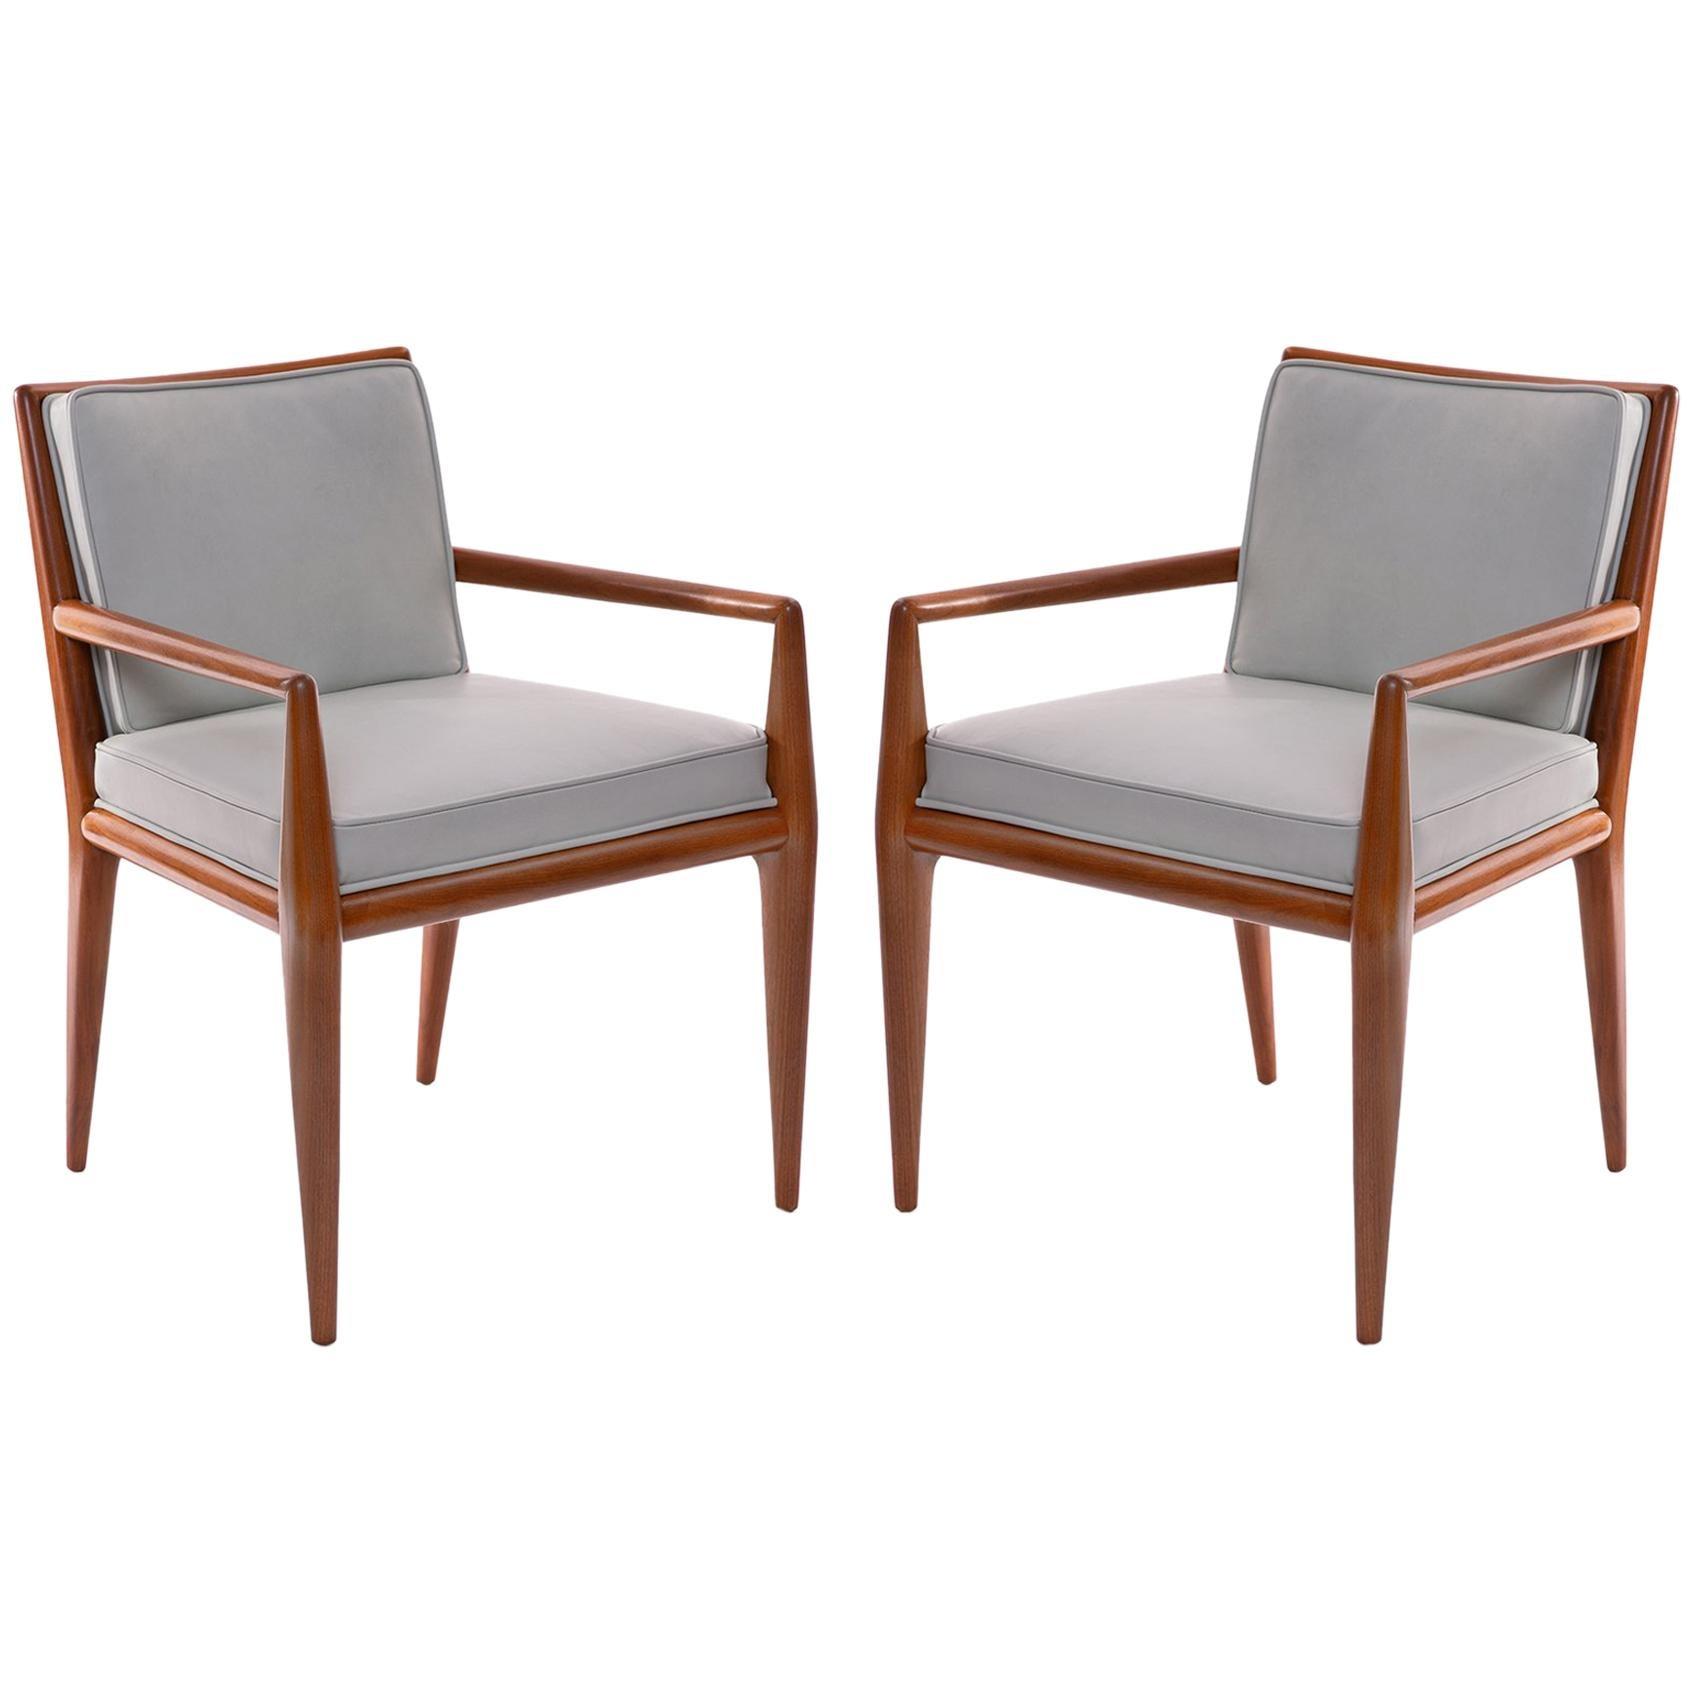 T.H. Robsjohn-Gibbings Widdicomb Walnut Leather Armchairs